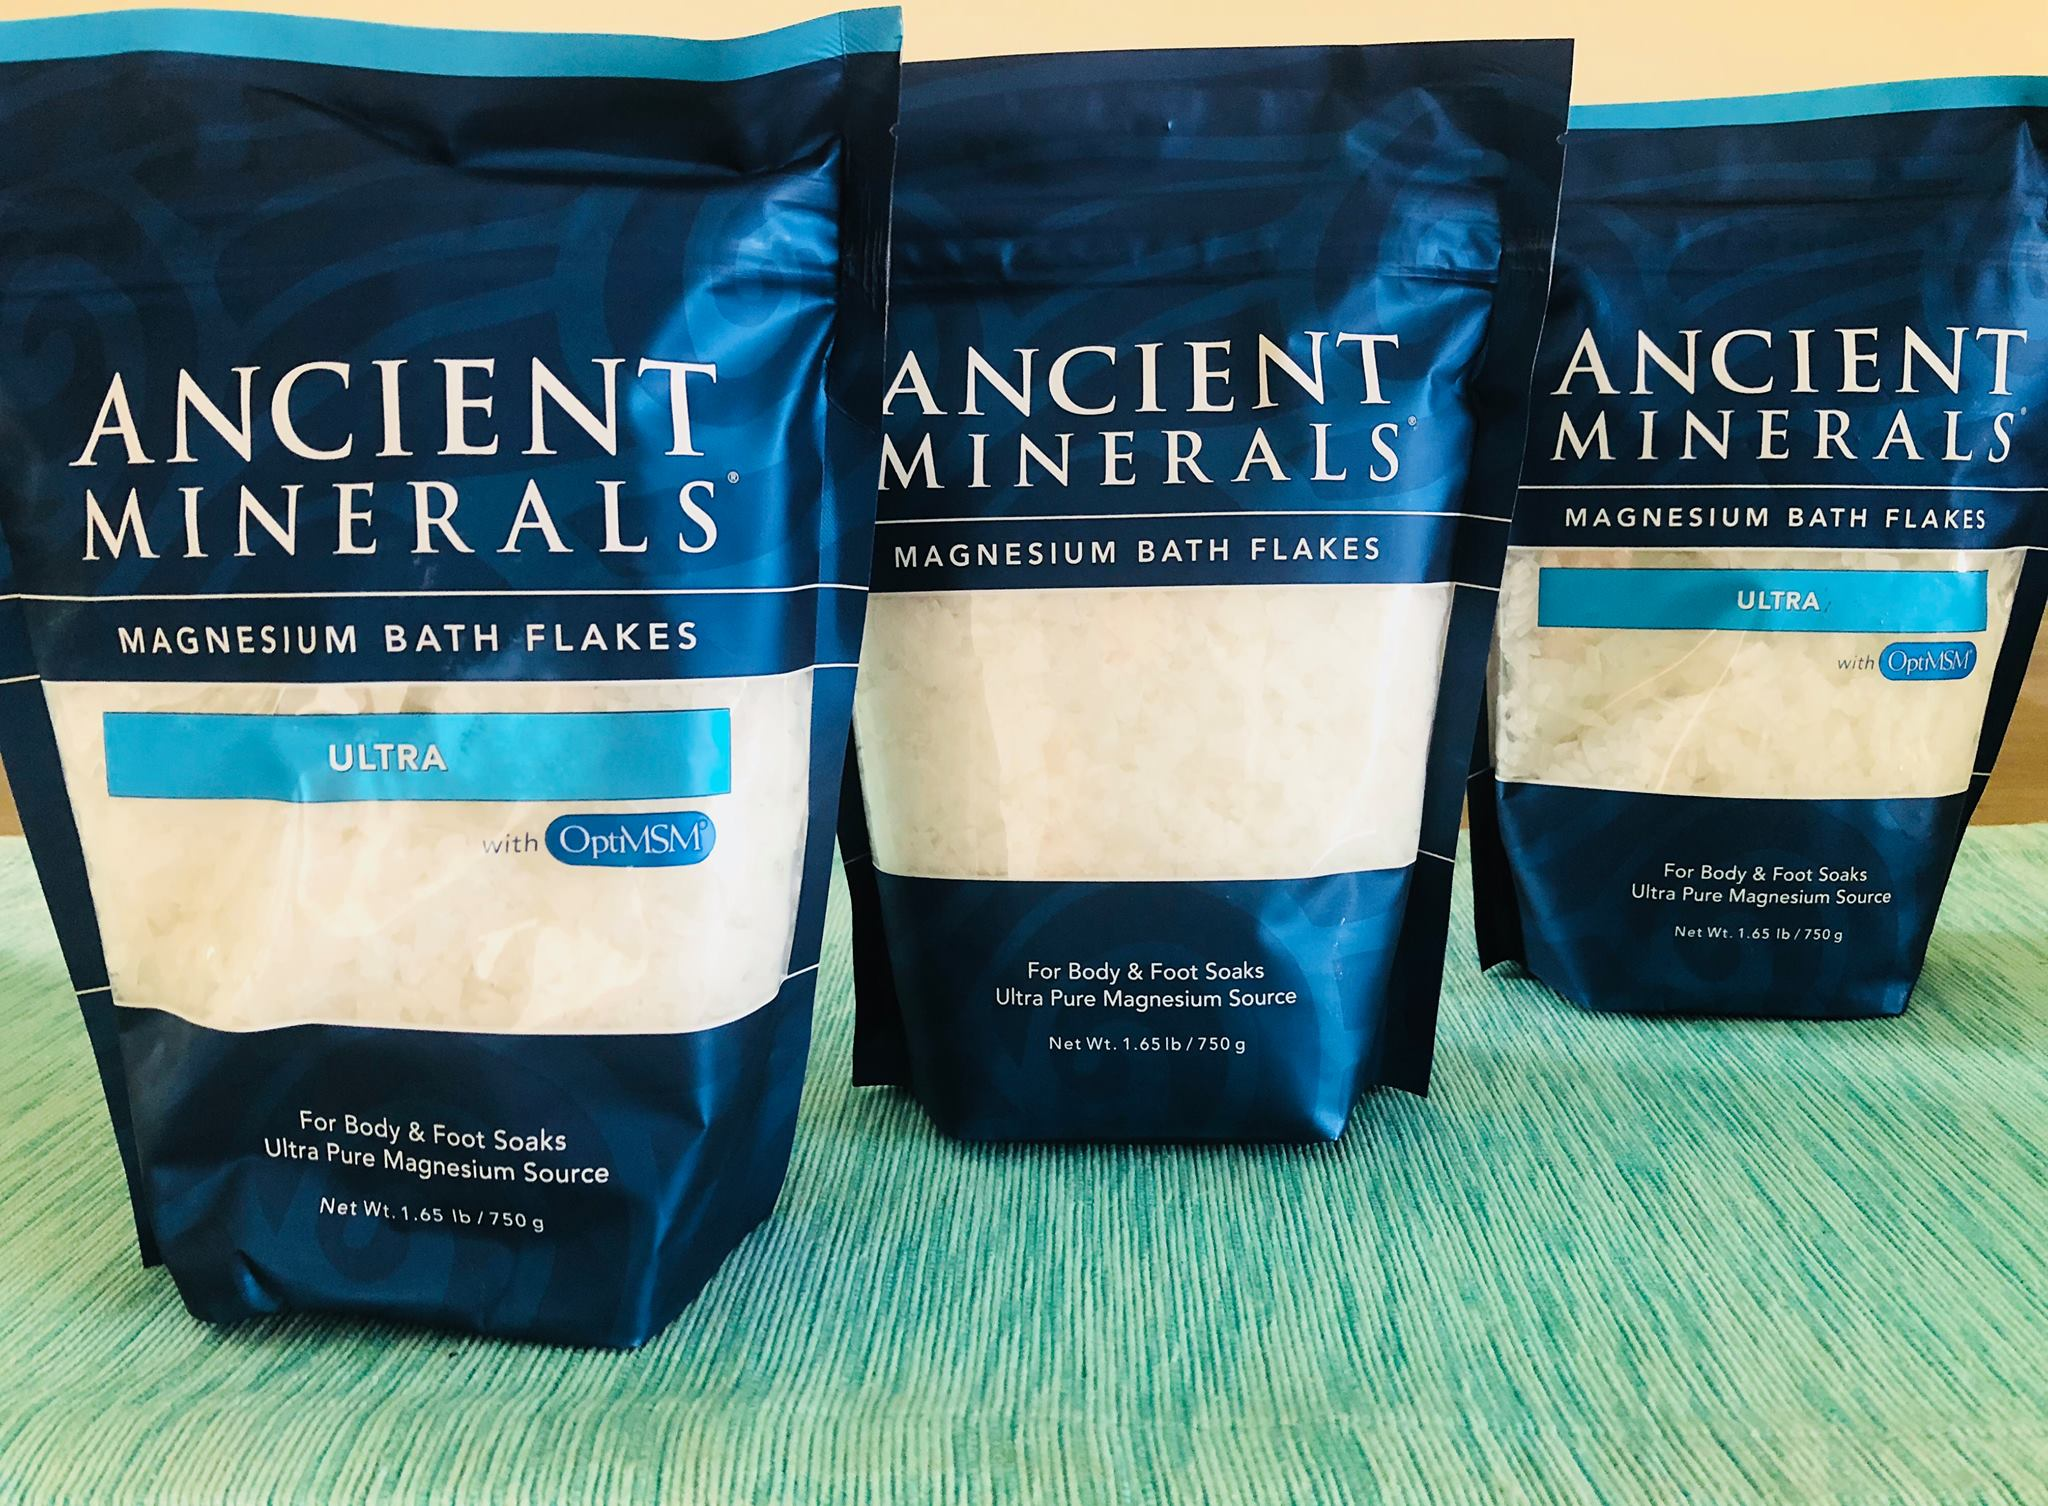 Magnesium for Energy Bath   Gifts of Healing   Pranic Energy Healing   Ripple Healing